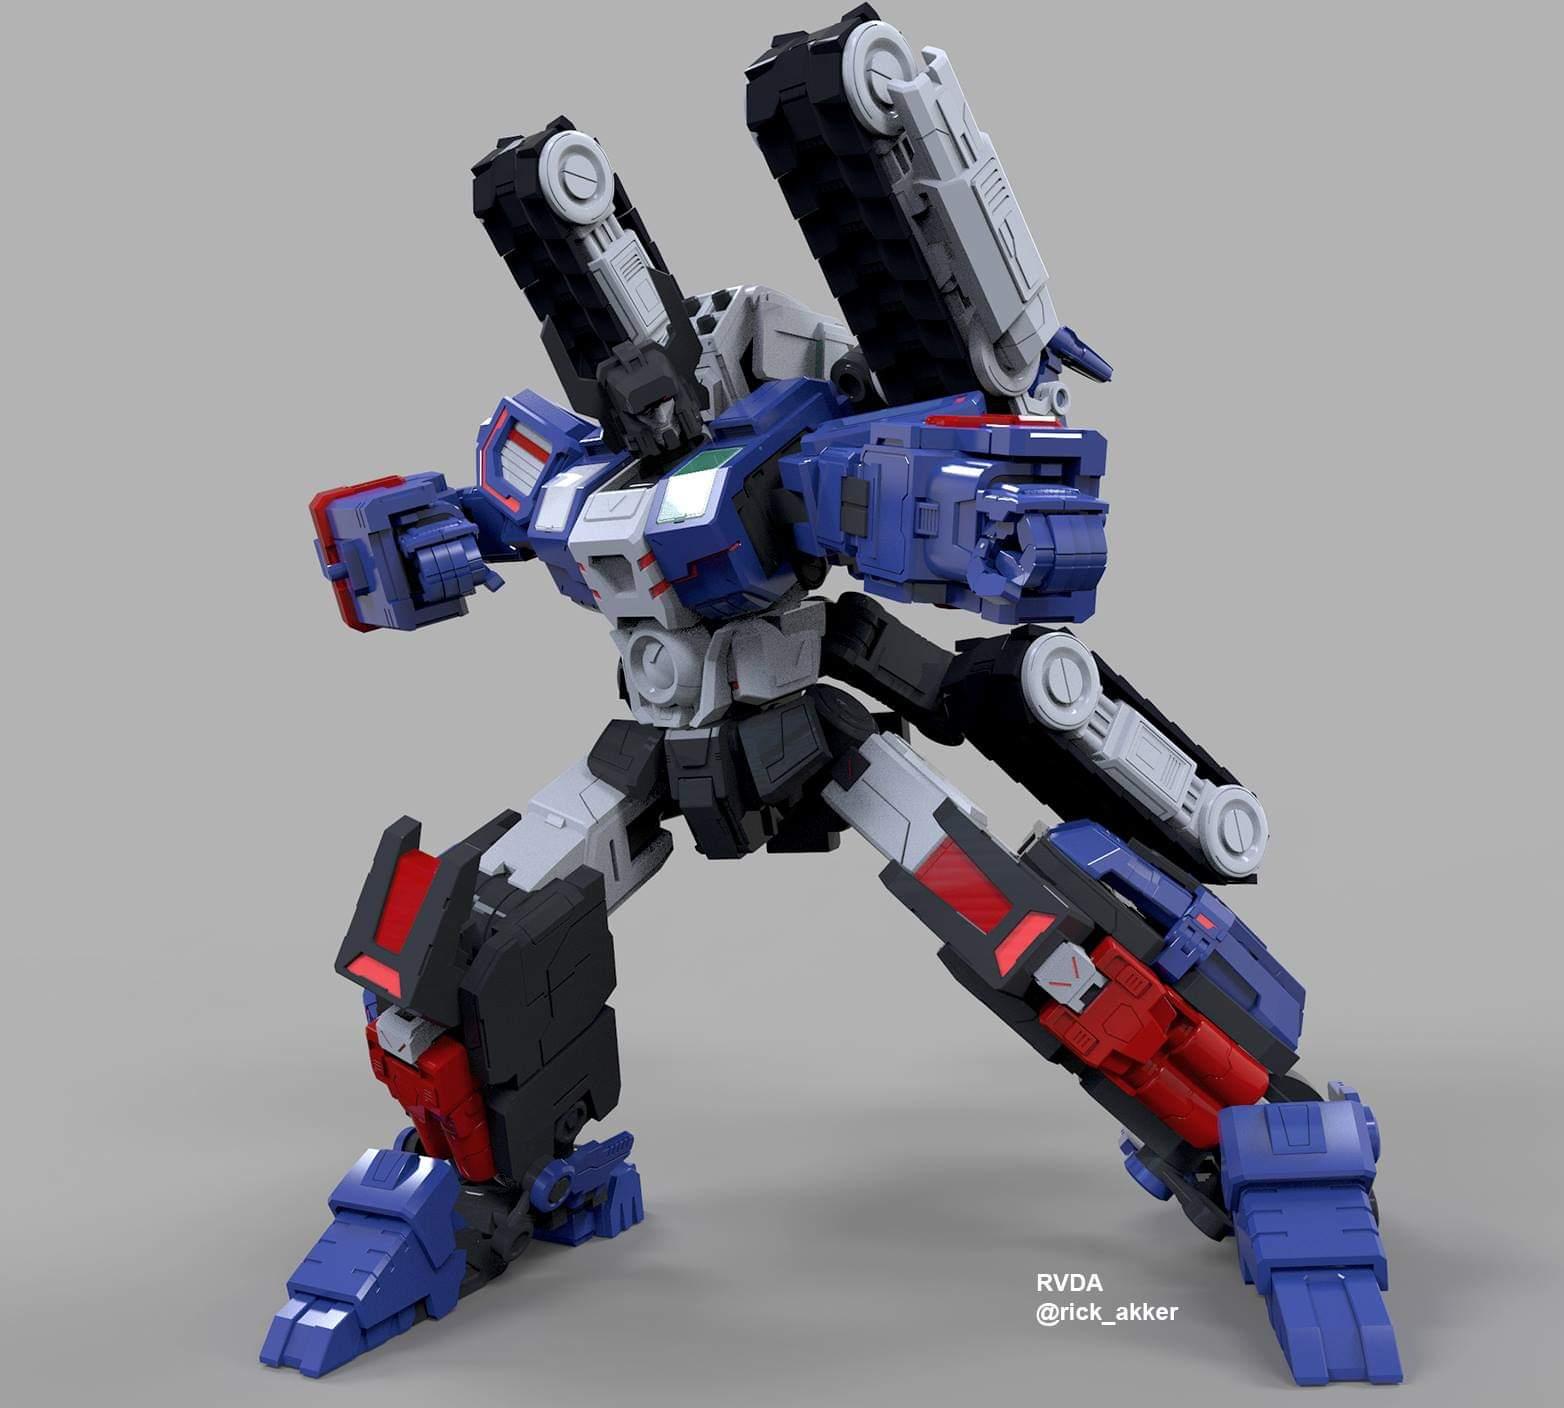 [Mastermind Creations] Produit Tiers - R-50 Supermax - aka Fortress/Forteresse Maximus des BD IDW TKMtGA3r_o